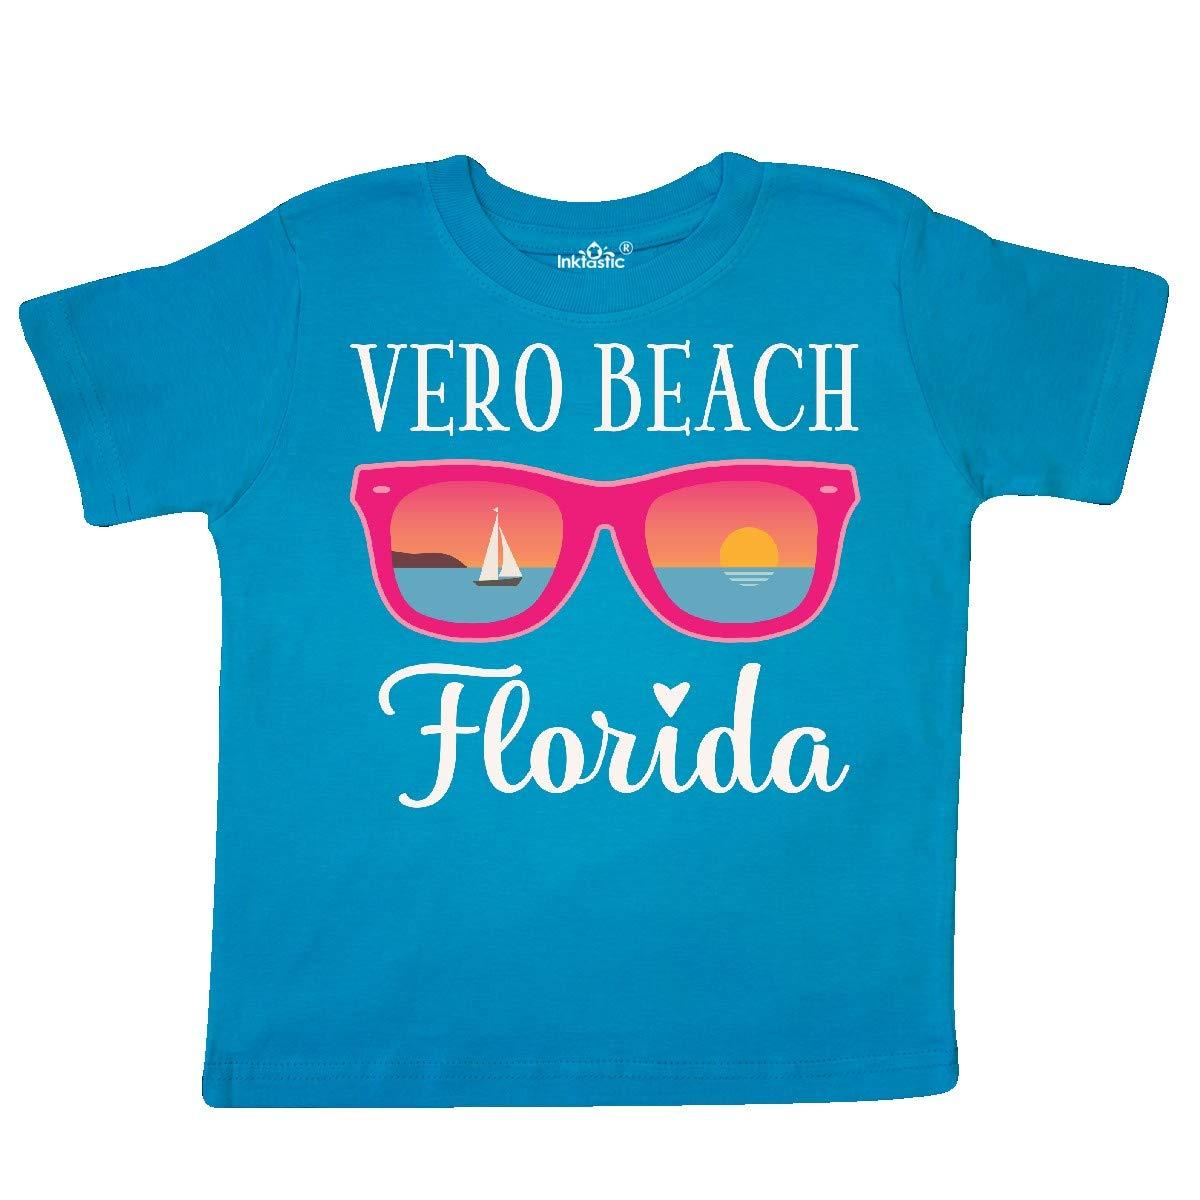 inktastic Vero Beach Florida Vacation Trip Toddler T-Shirt